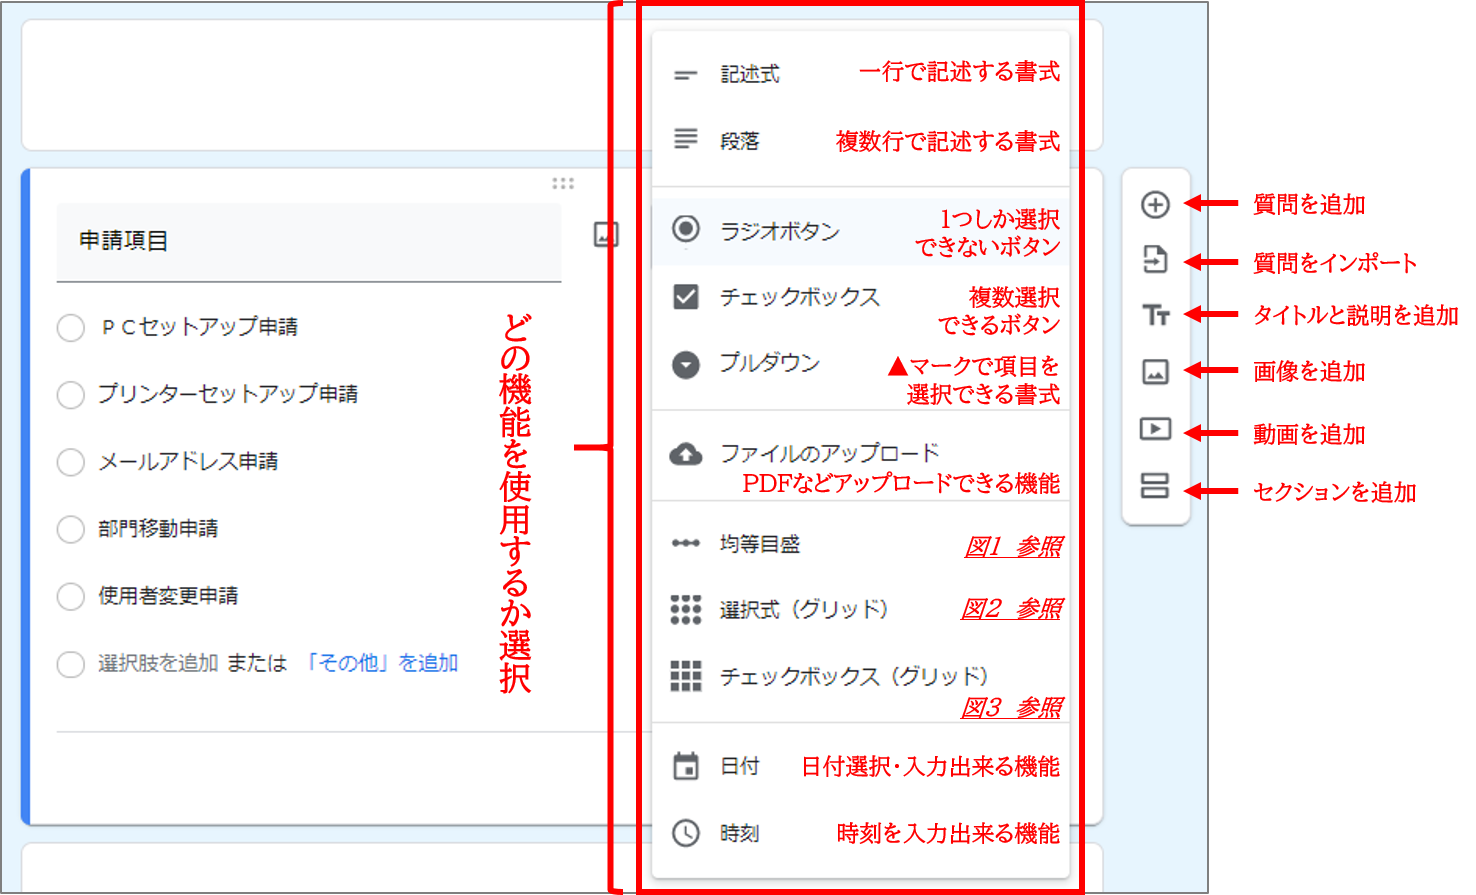 93-3_Googleサイト用_業務依頼書テンプレート編集画面